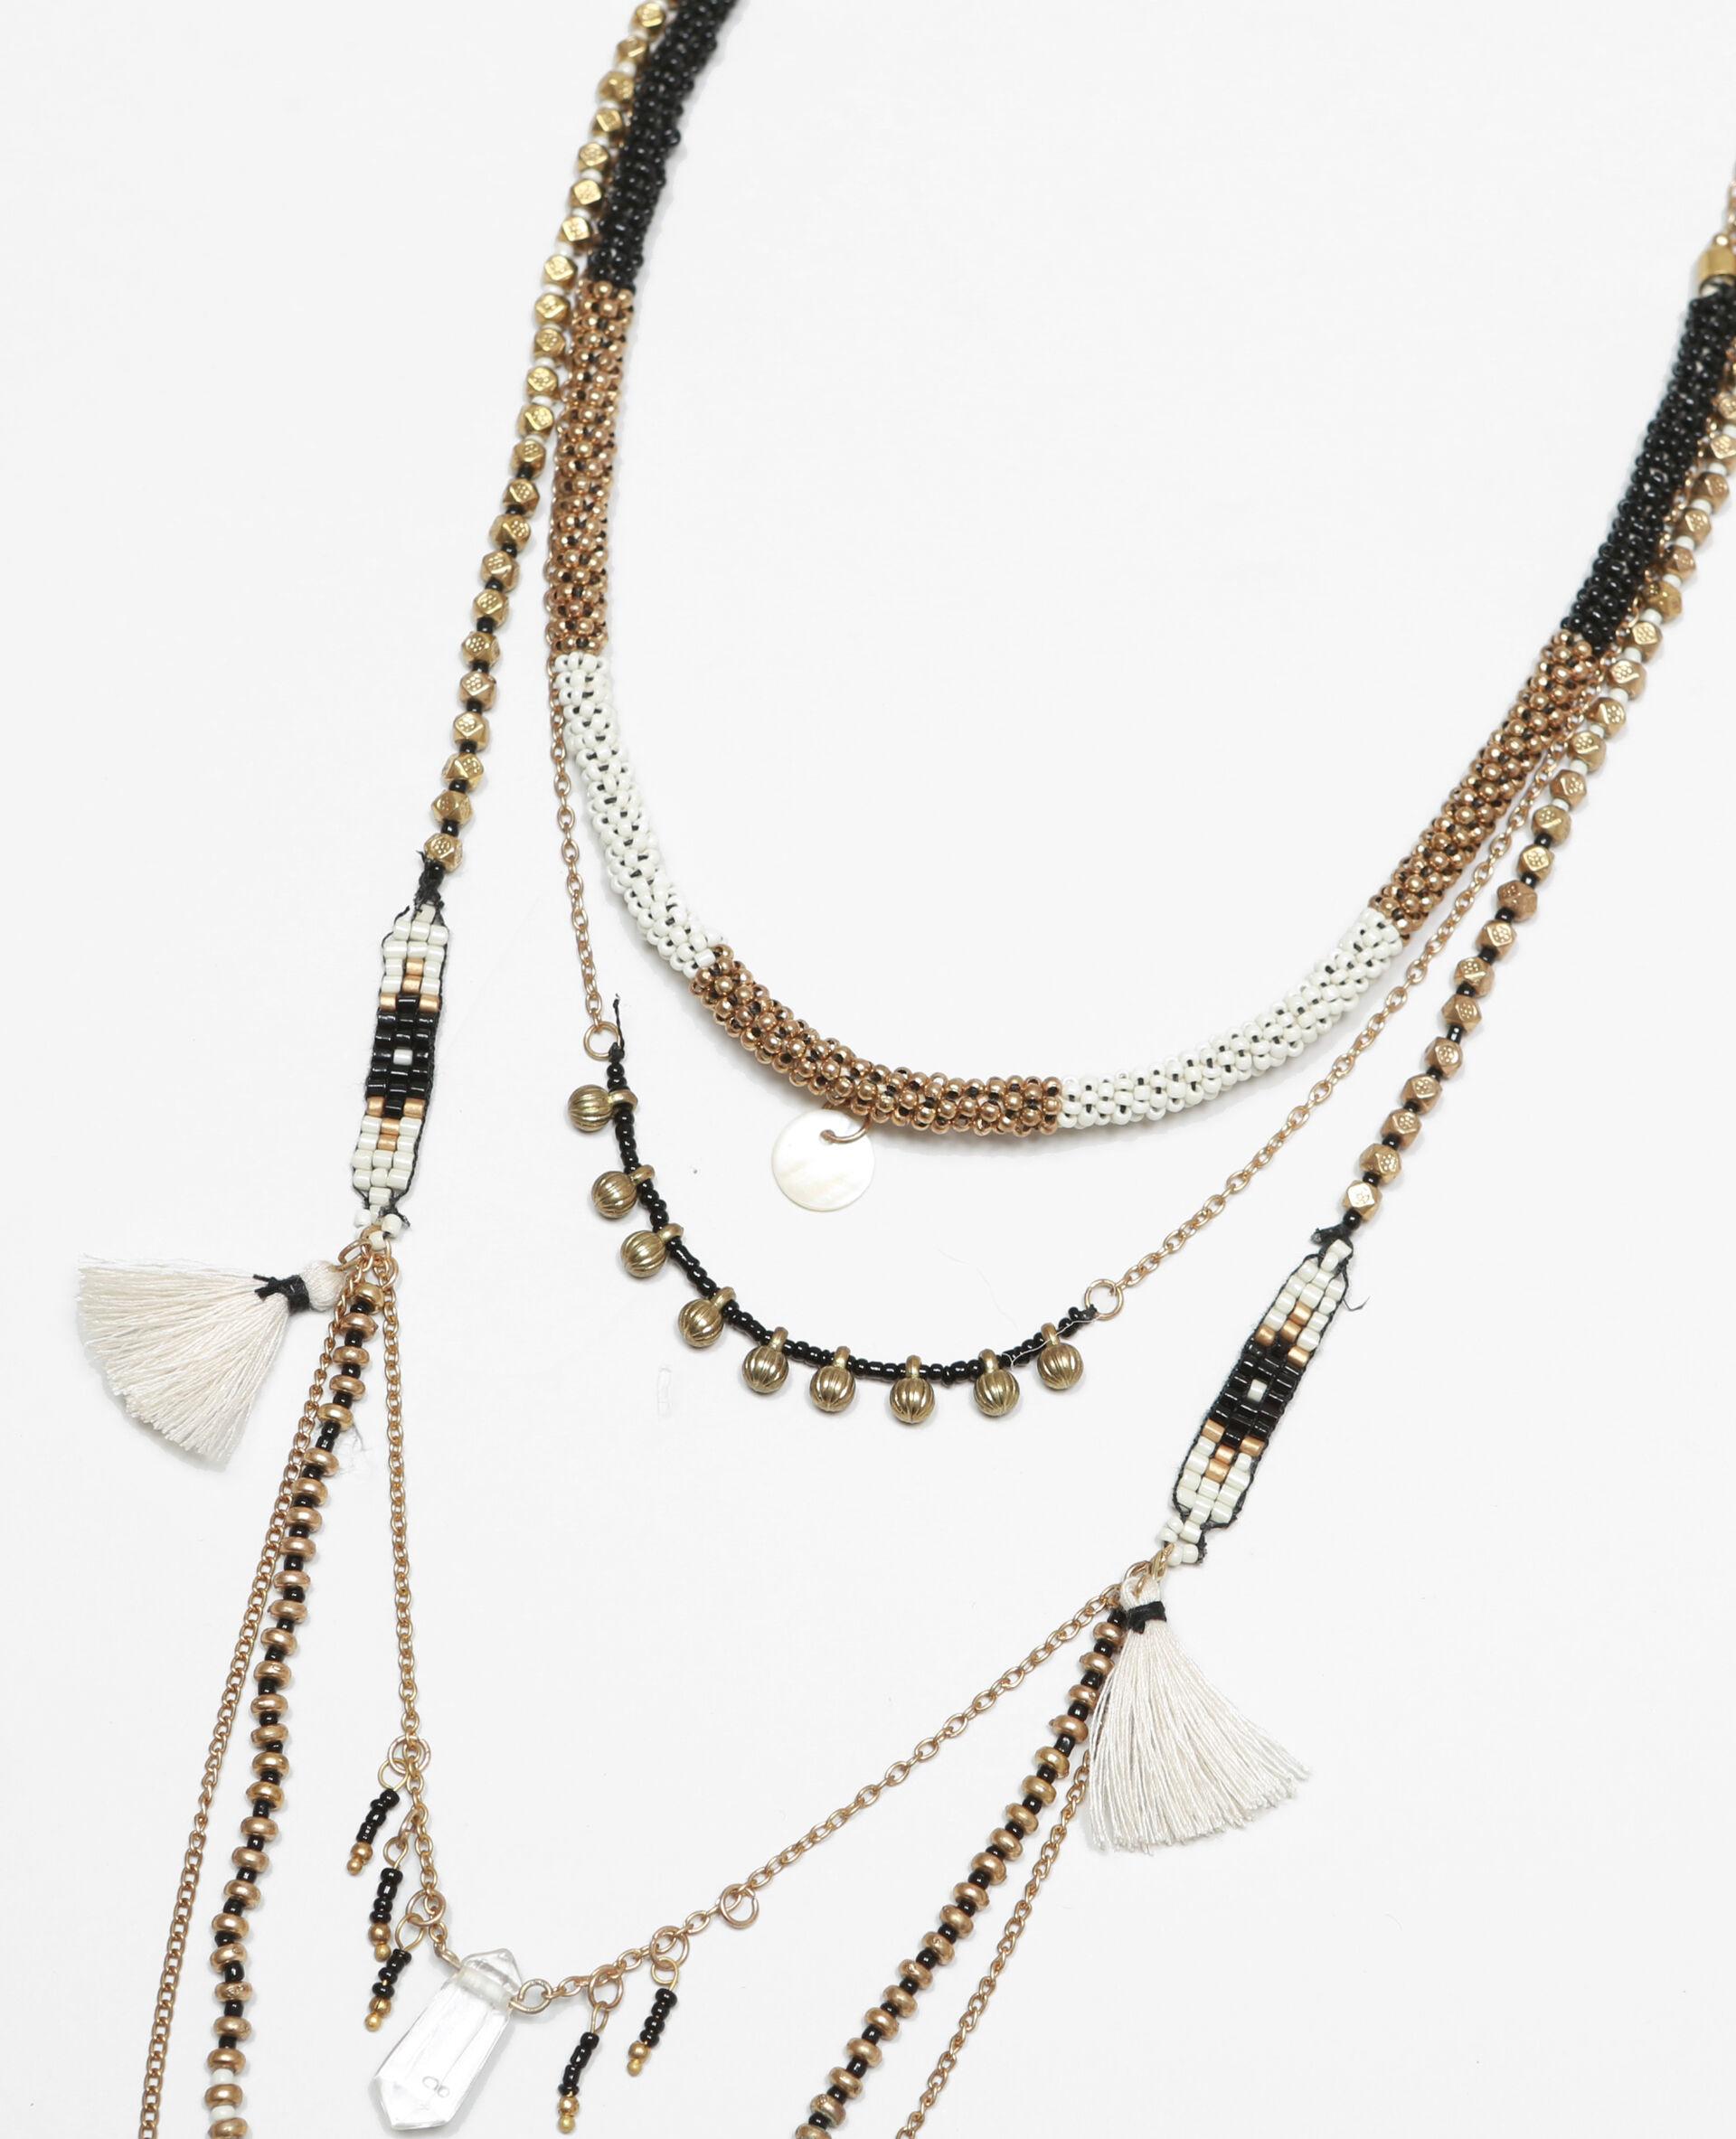 Les colliers multi rangs